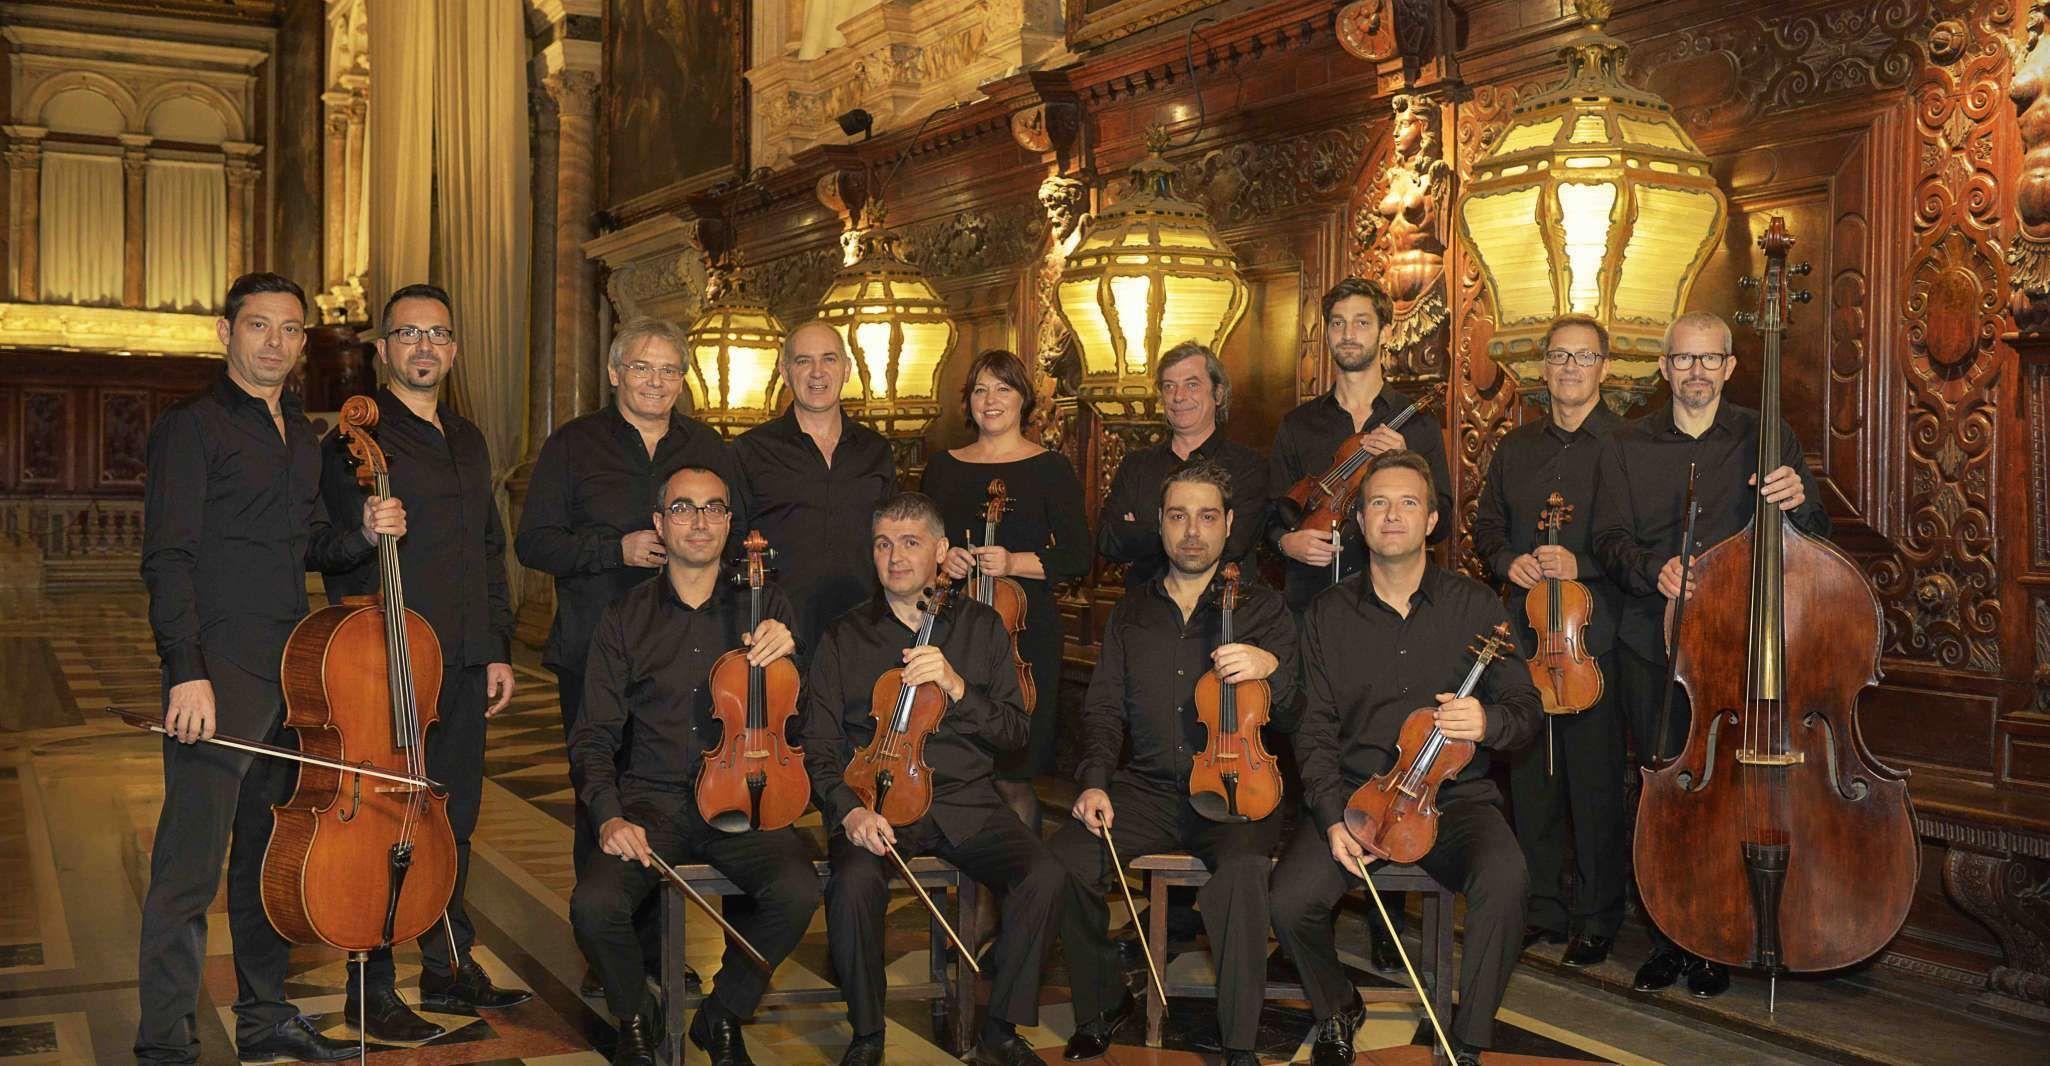 Venice: Classical Music Concert at Church of San Vidal